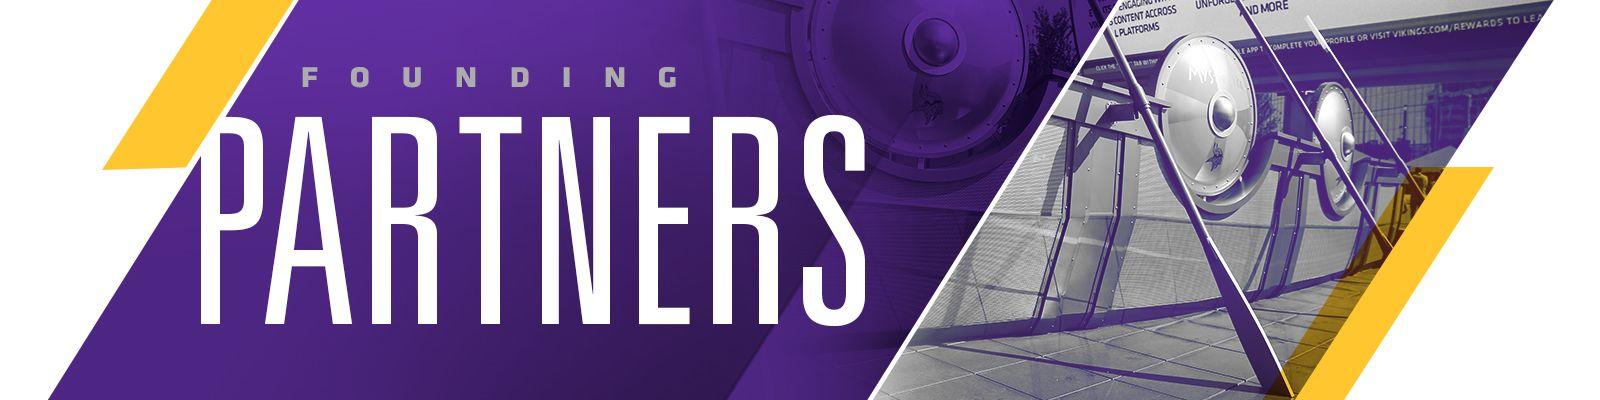 FoundingPartners_Header